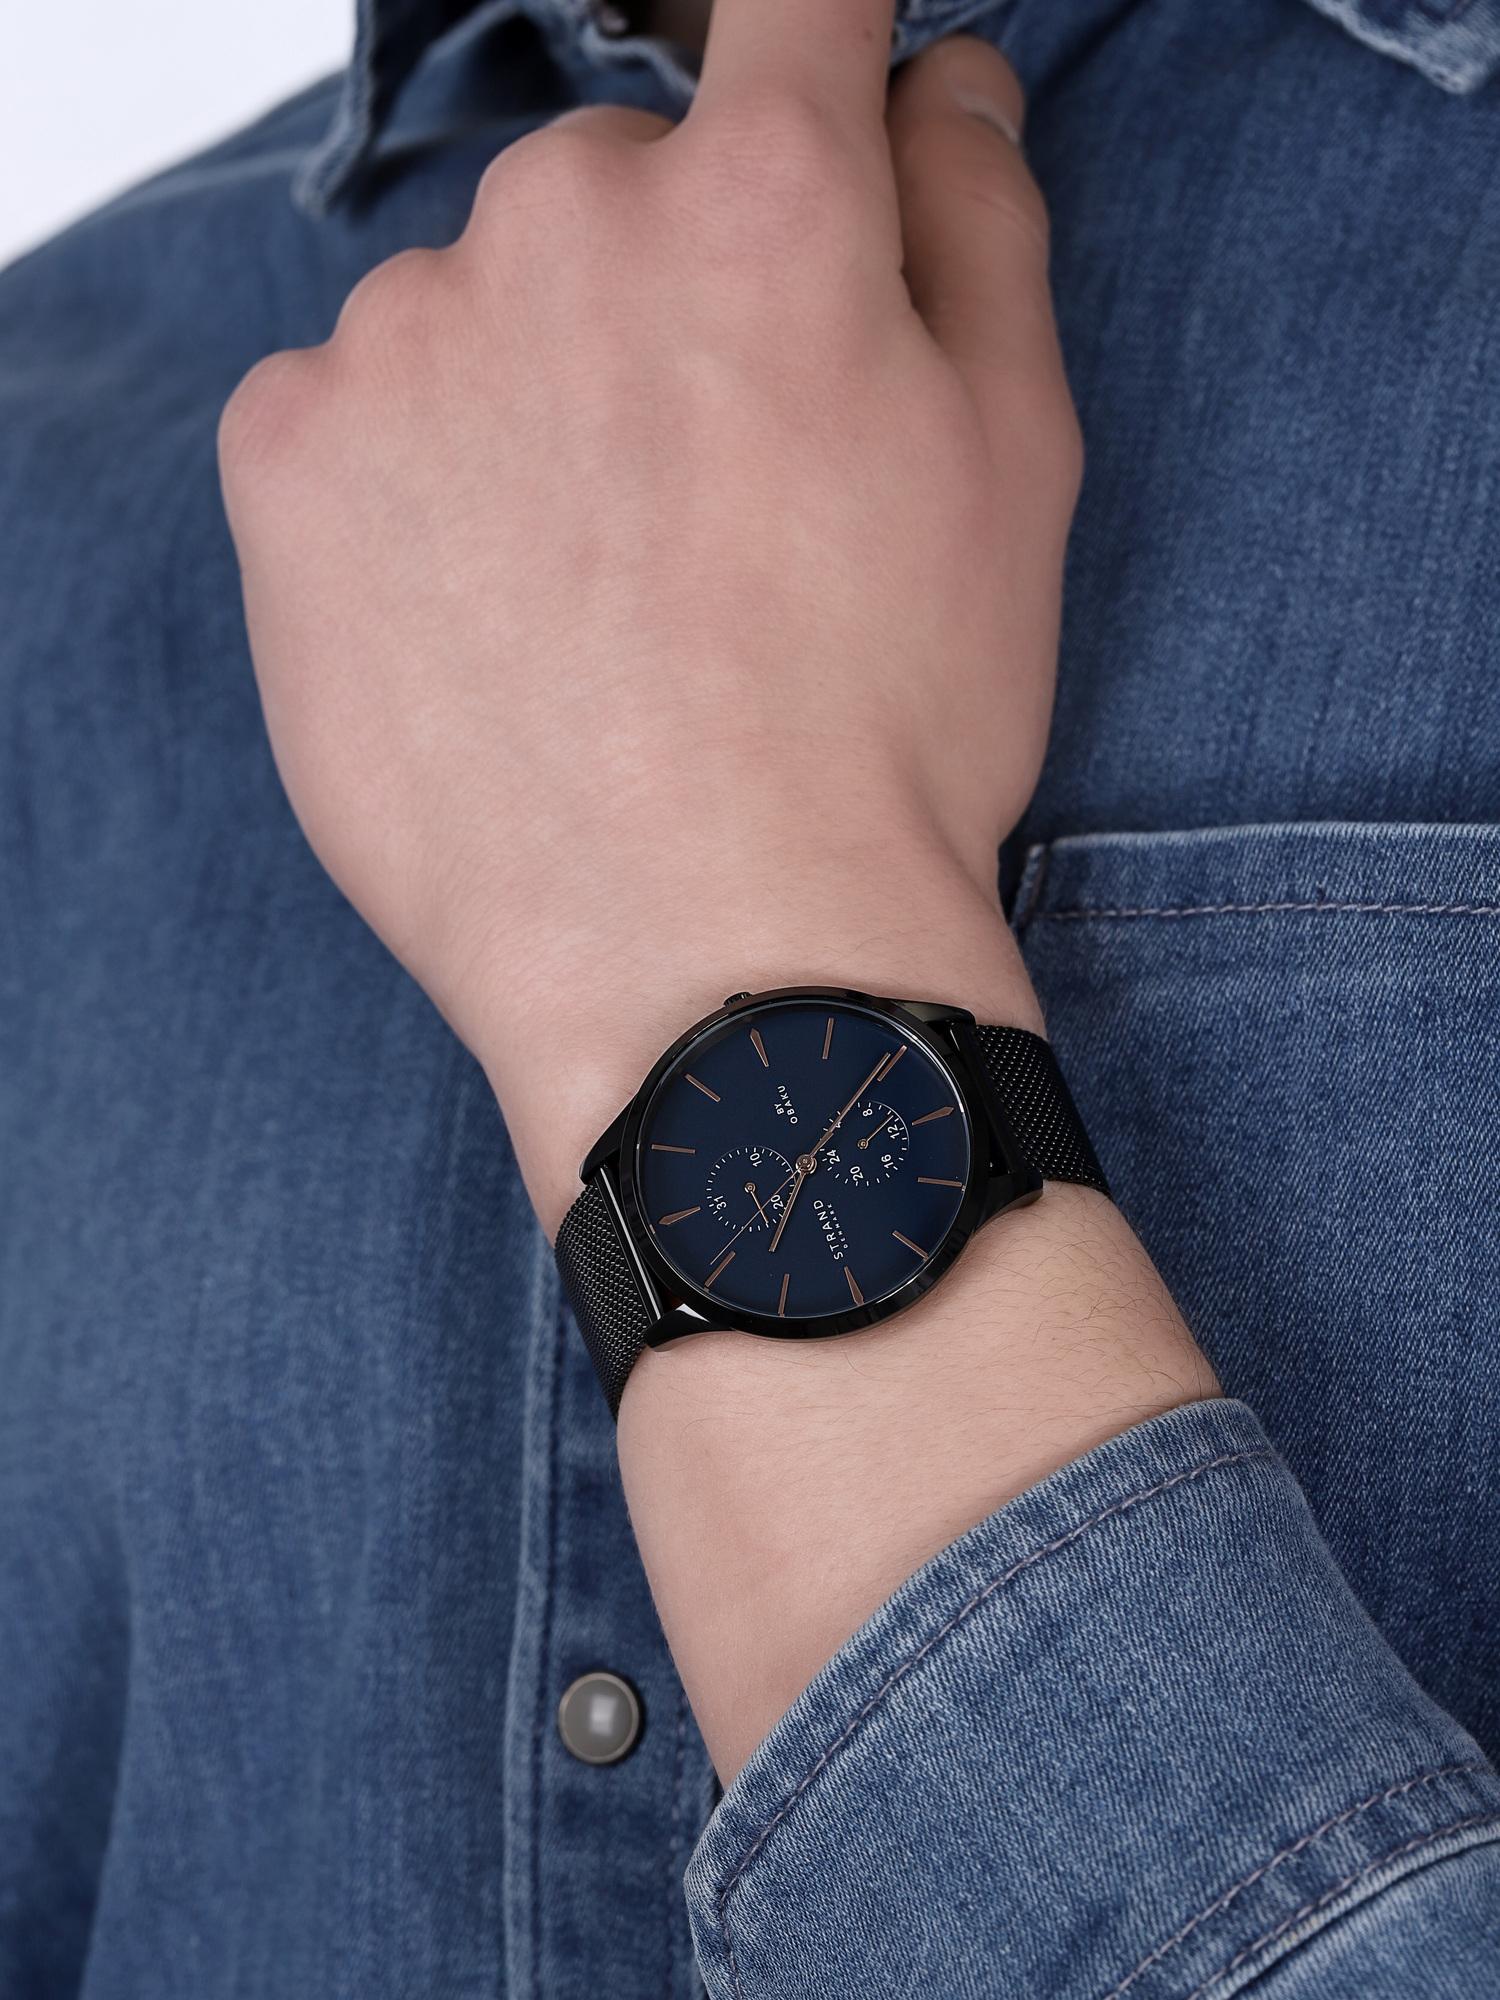 Strand S703GMBLMB męski zegarek Beaufort bransoleta